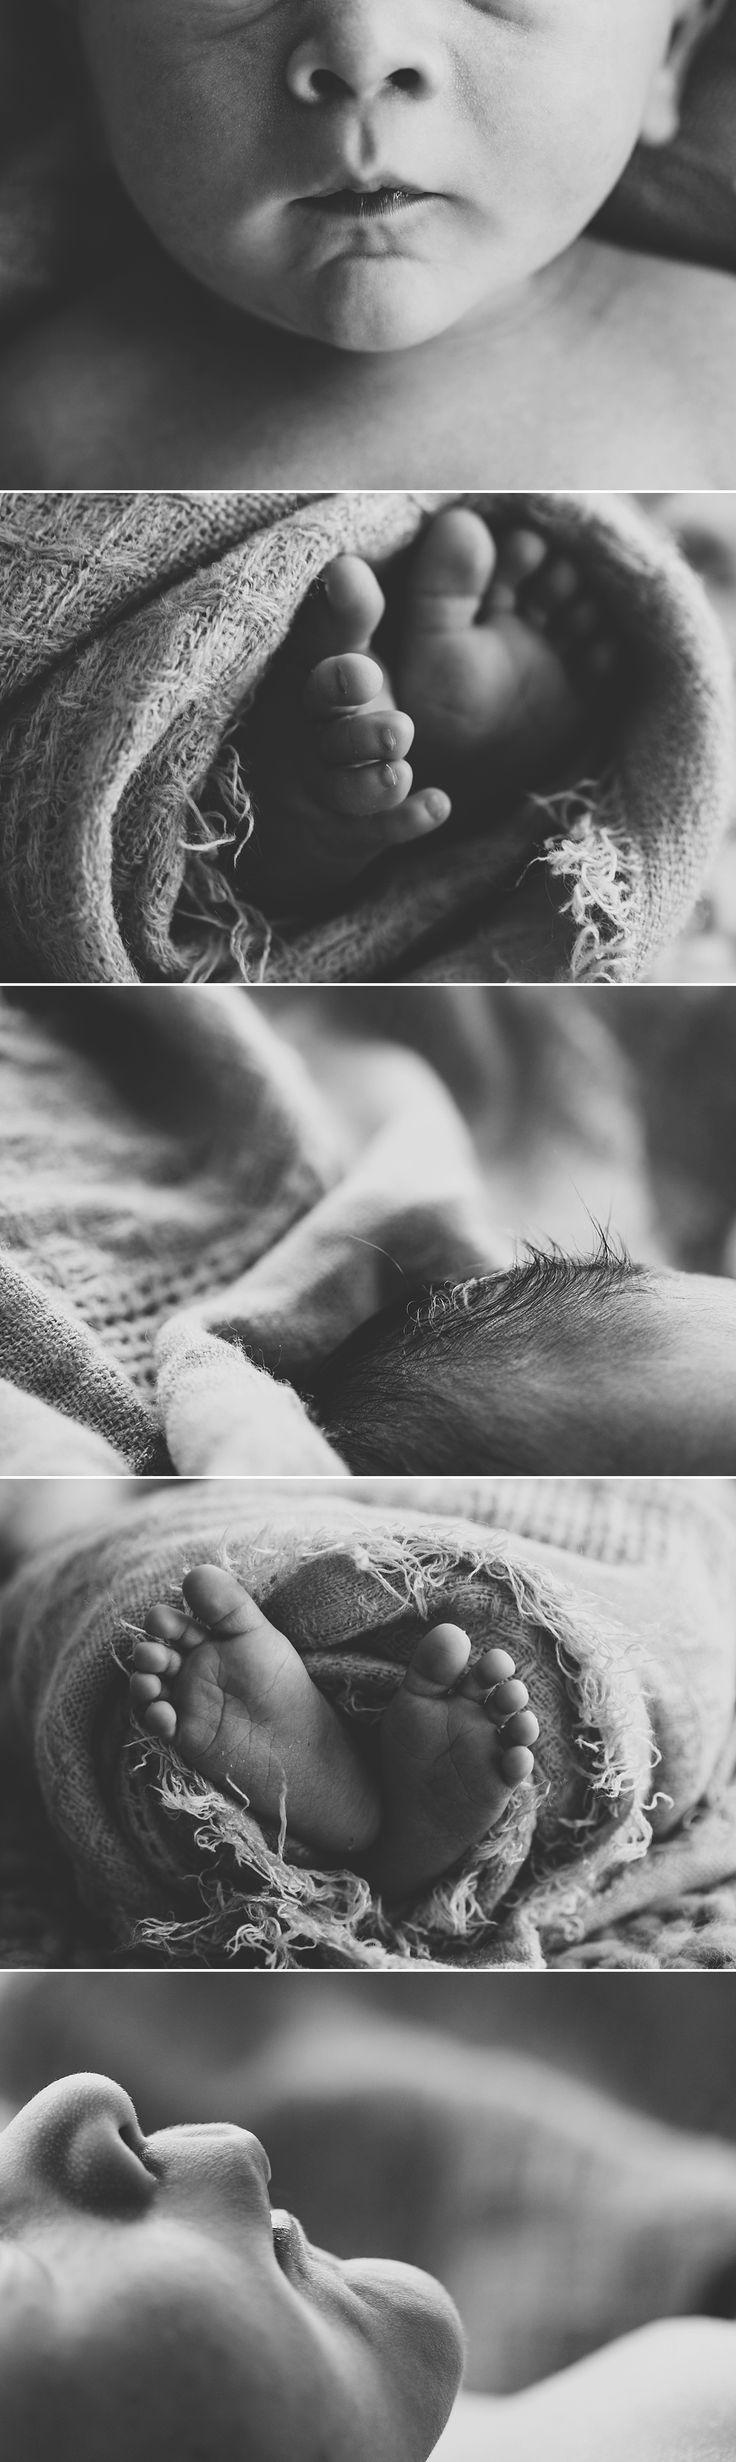 Suzie Ziemke Photography ∆ Janesville, Elysian, Mankato, MN Portrait and Lifestyle Photographer